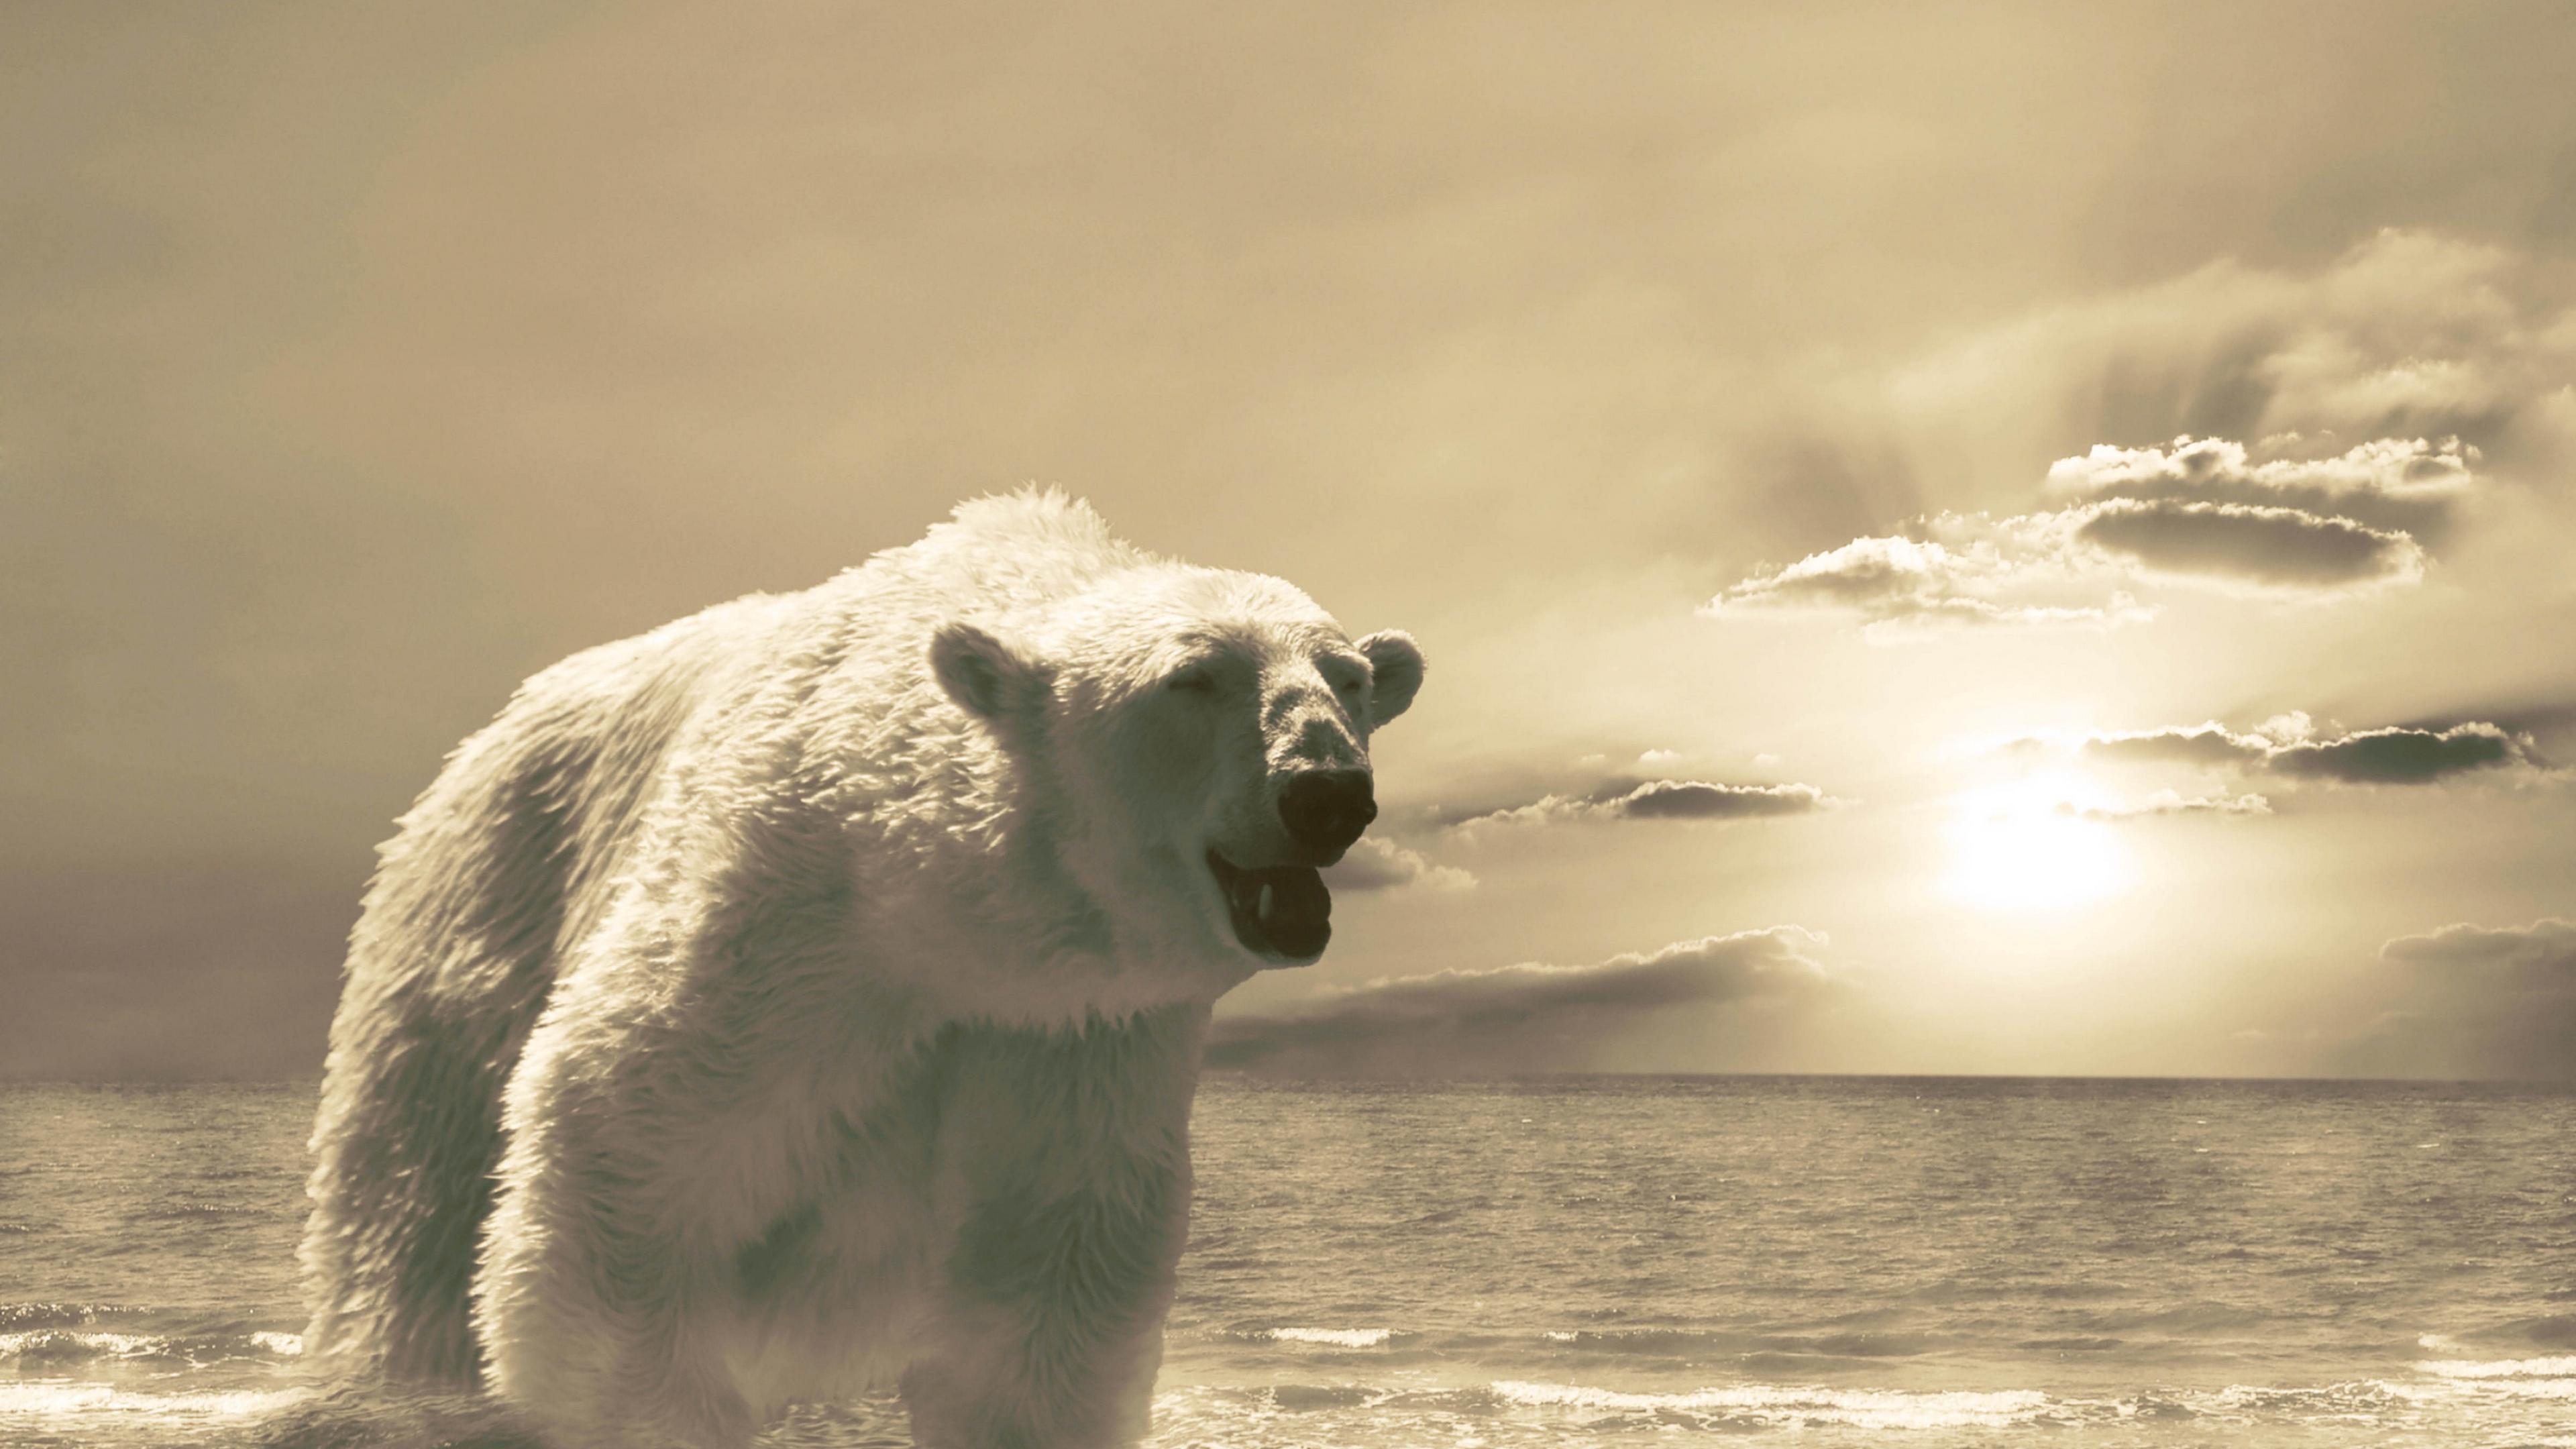 bear ice ocean cold snow winter 4k 1542242896 - bear, ice, ocean, cold, snow, winter 4k - Ocean, Ice, Bear